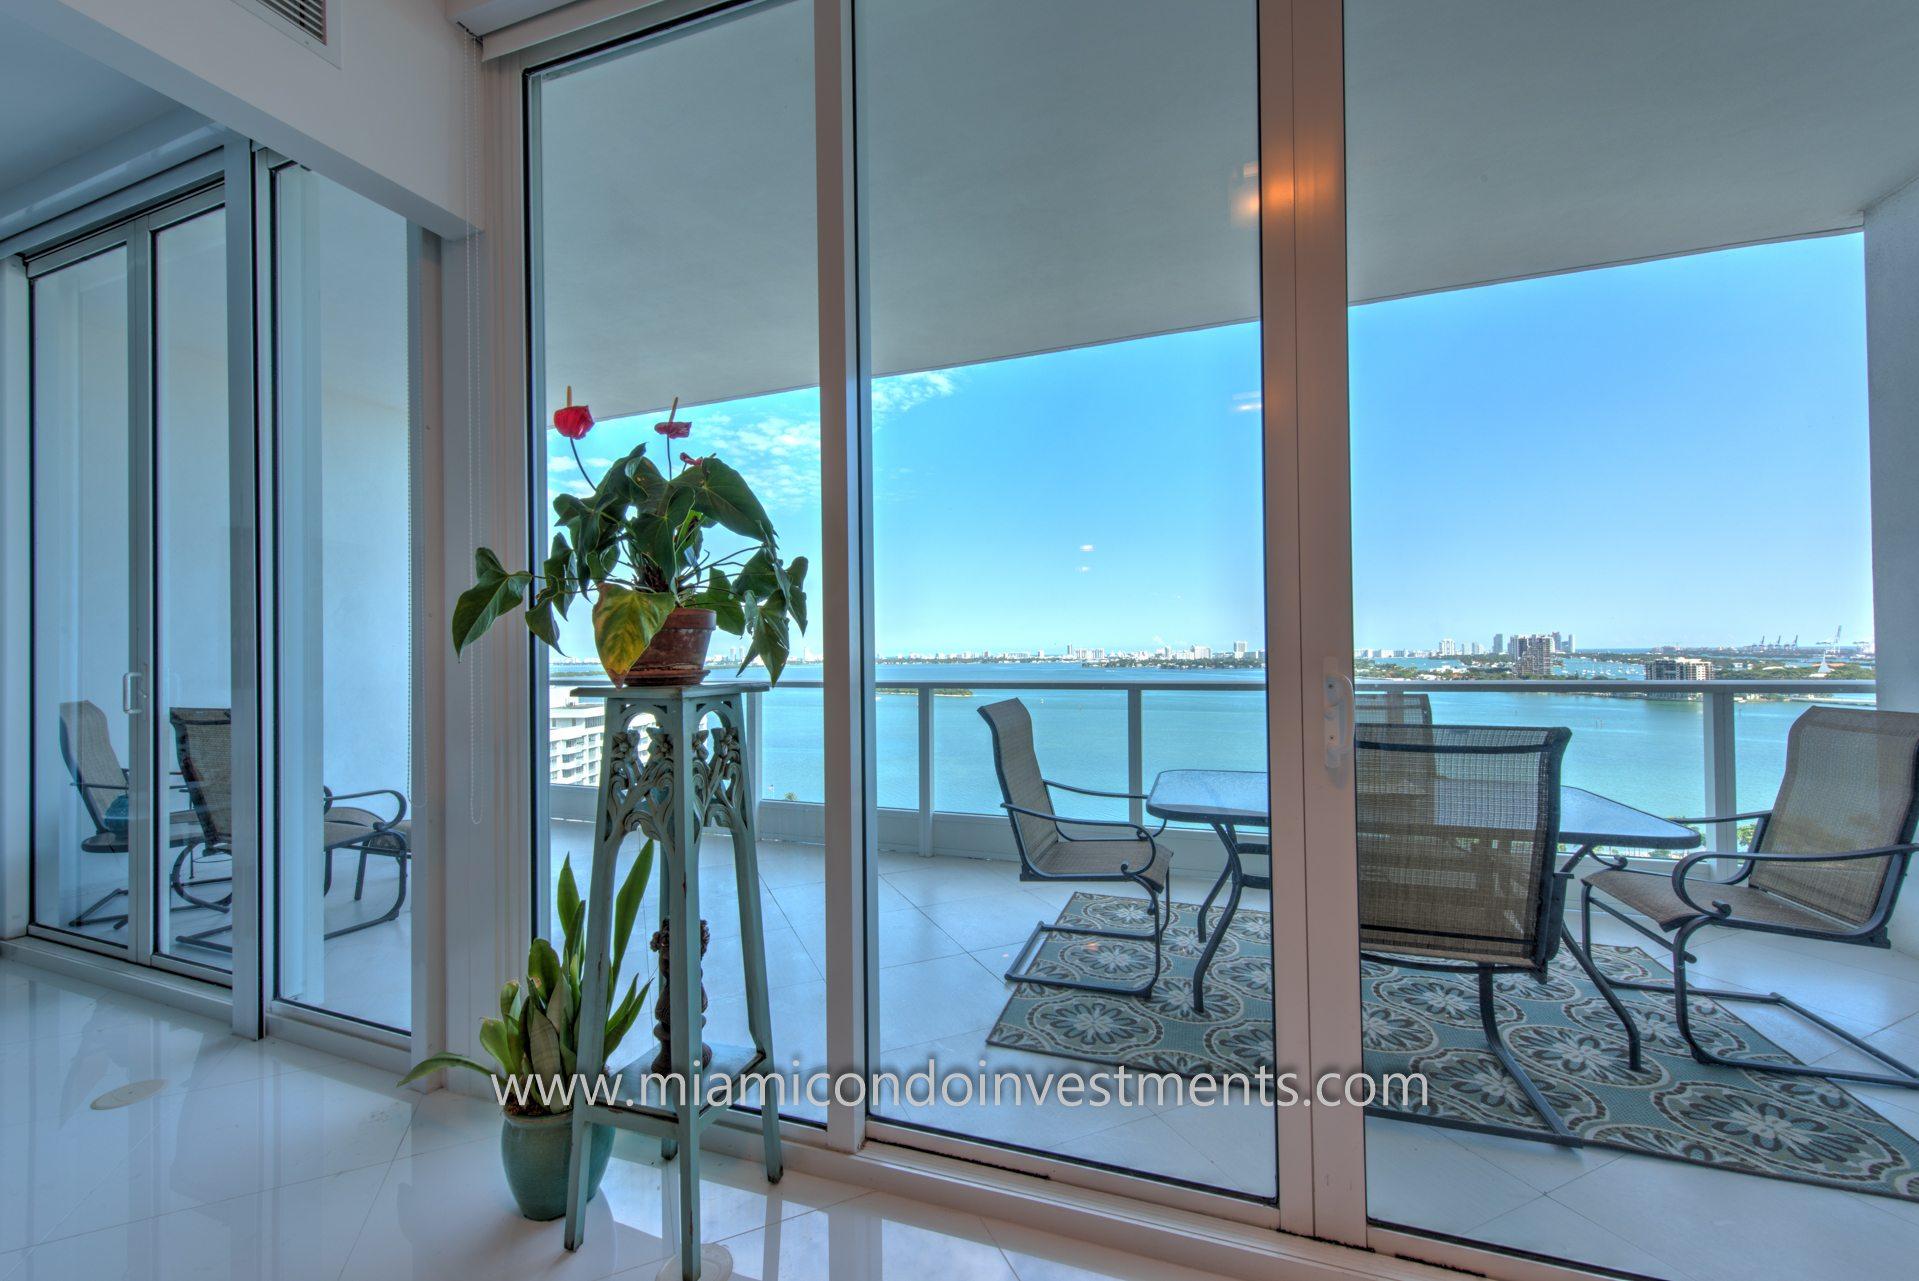 Direct bay views from Paramount Bay condo in Miami